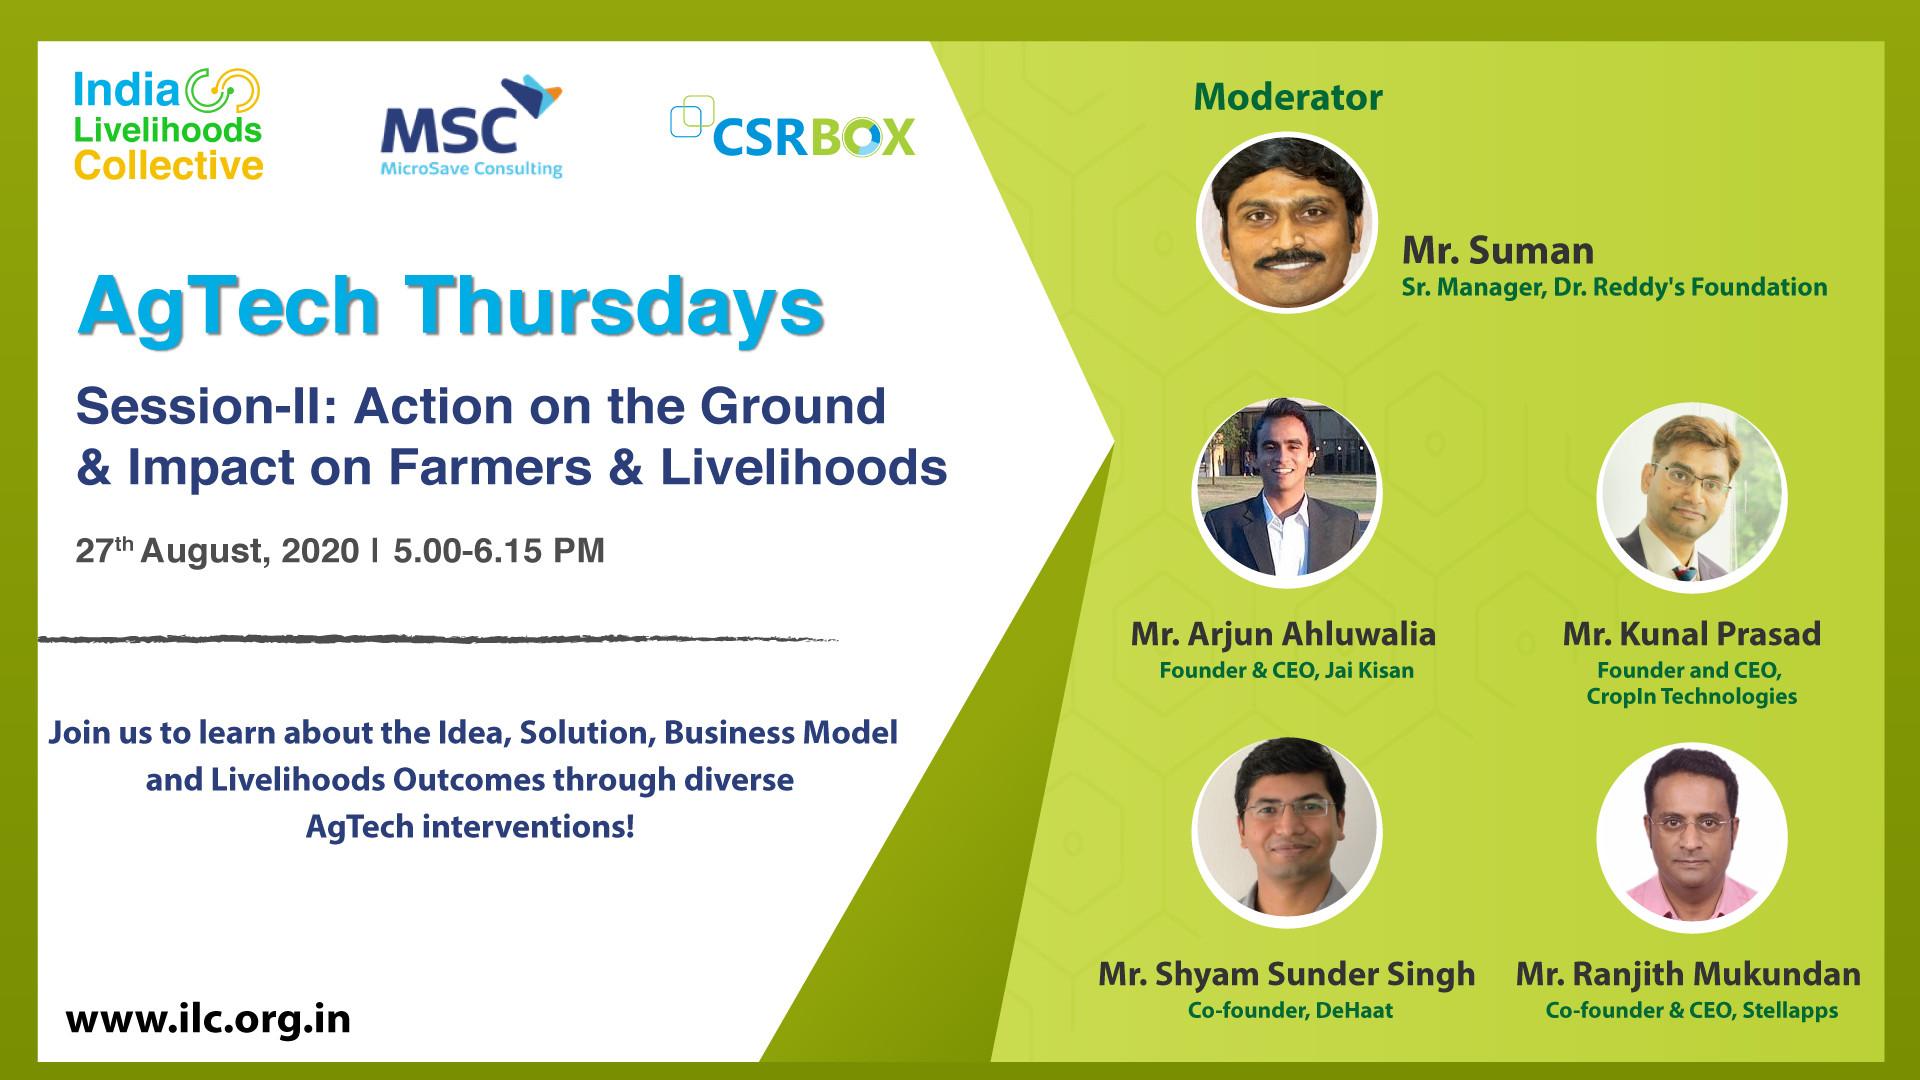 AgTech Thursday II: Action on Ground & Impact on Farmers & Livelihoods